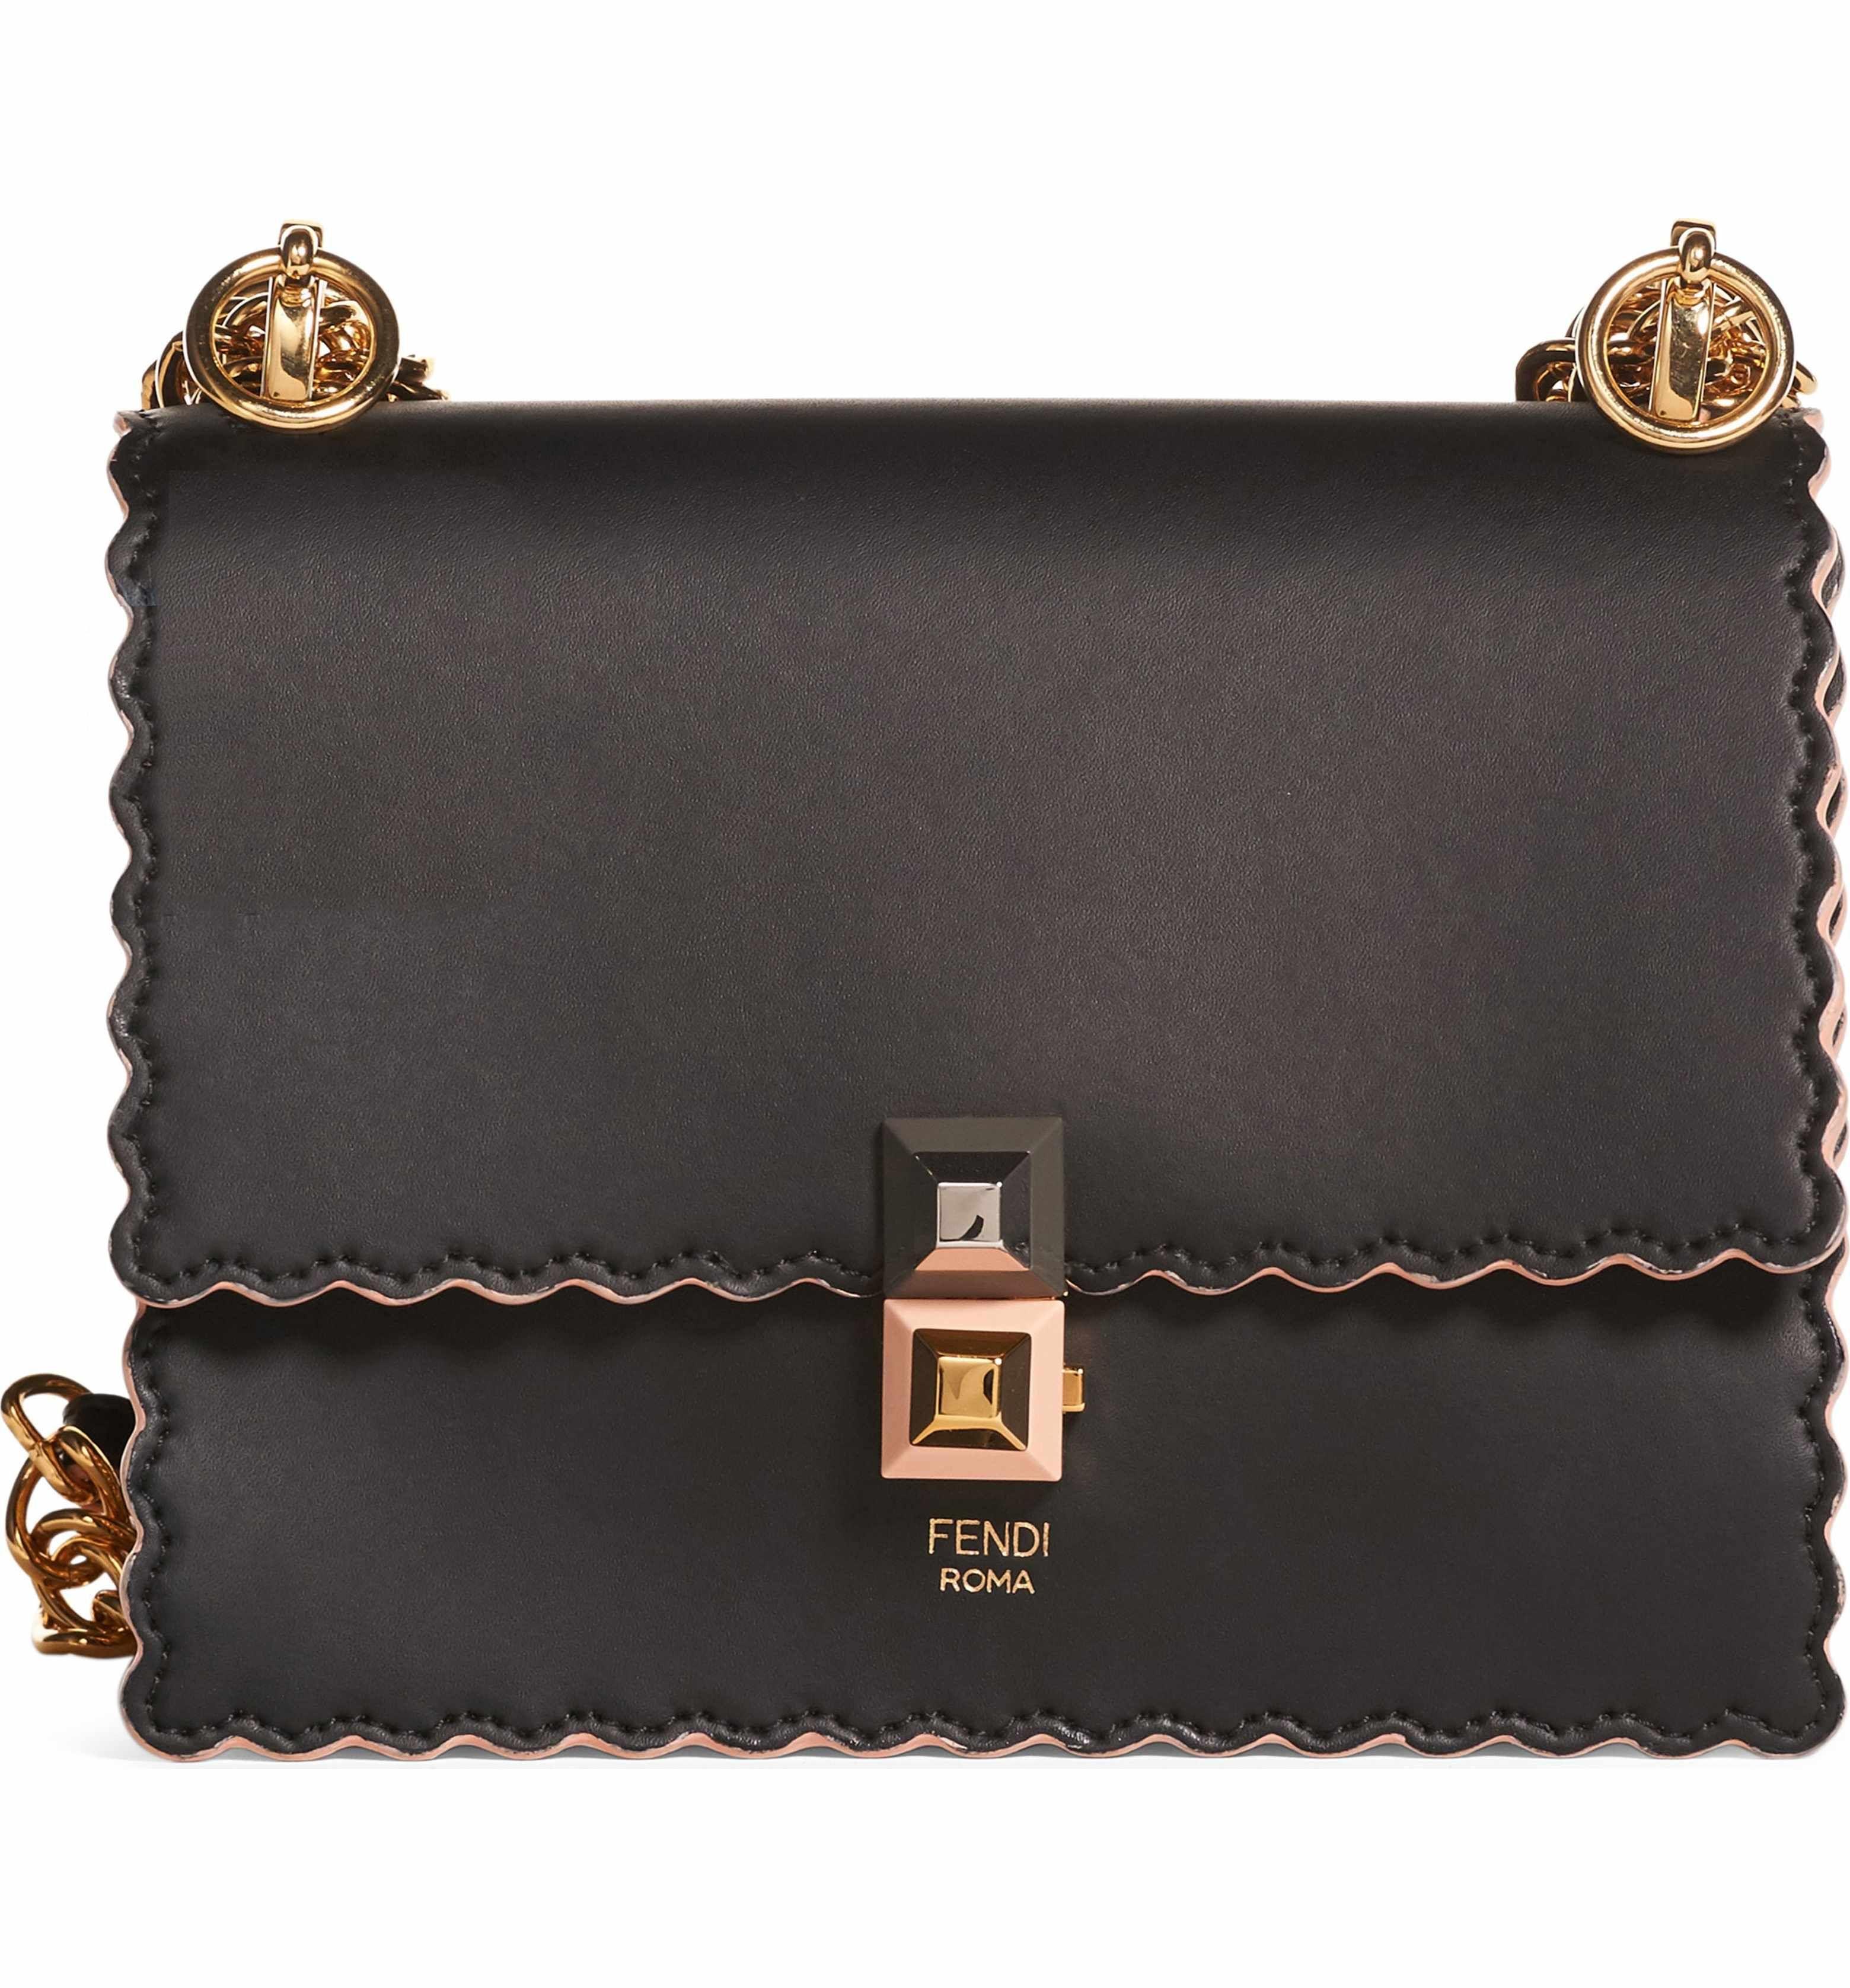 111fbbb575e6 Main Image - Fendi Small Kan I Scallop Leather Shoulder Bag Leather Purses